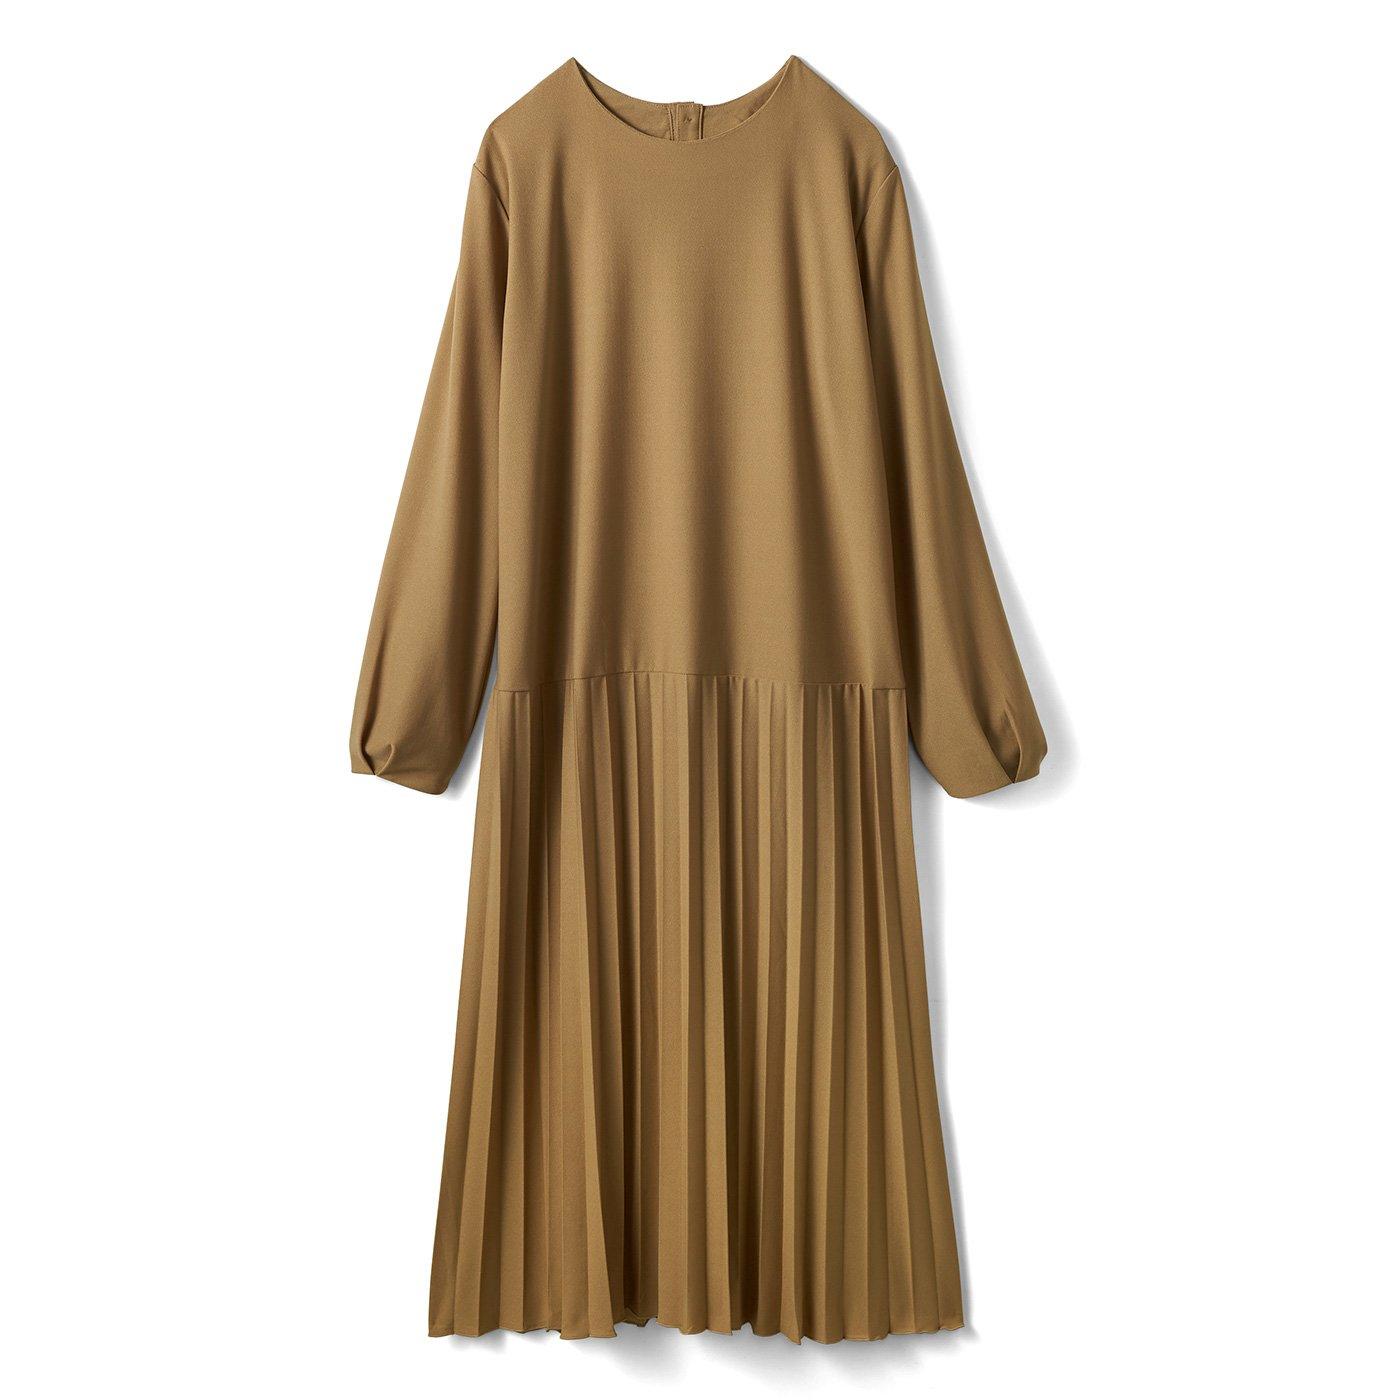 IEDIT[イディット] カットソージョーゼット素材できれいめ快適 プリーツスカート切り替え上品ワンピース〈キャメルベージュ〉